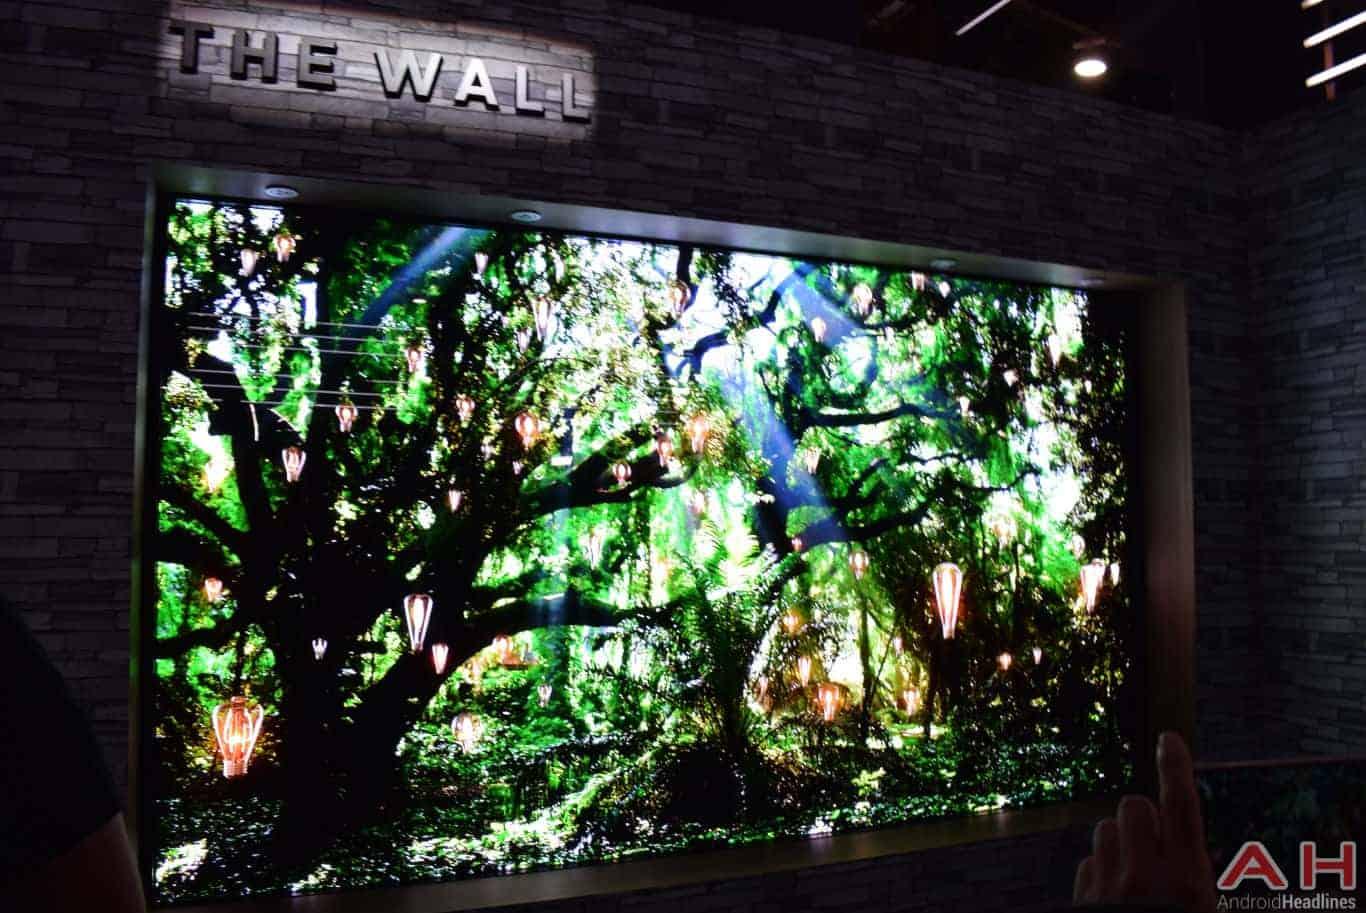 Samsung The Wall Modular MicroLED TV CES 2018 AH 5